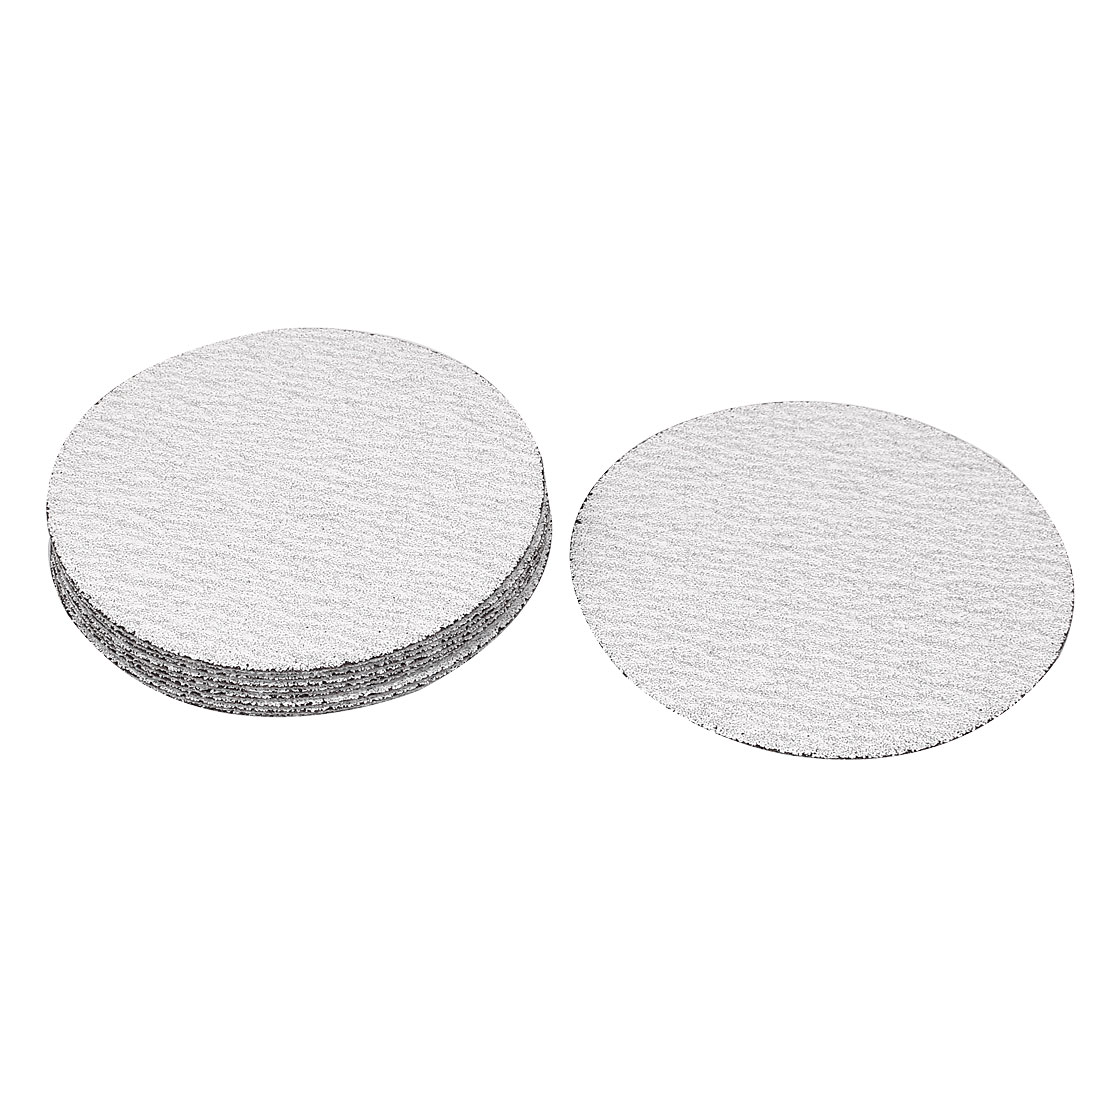 "4"" Dia Polishing Round Dry Abrasive Sanding Sandpaper Sheet Disc 120 Grit 10pcs"